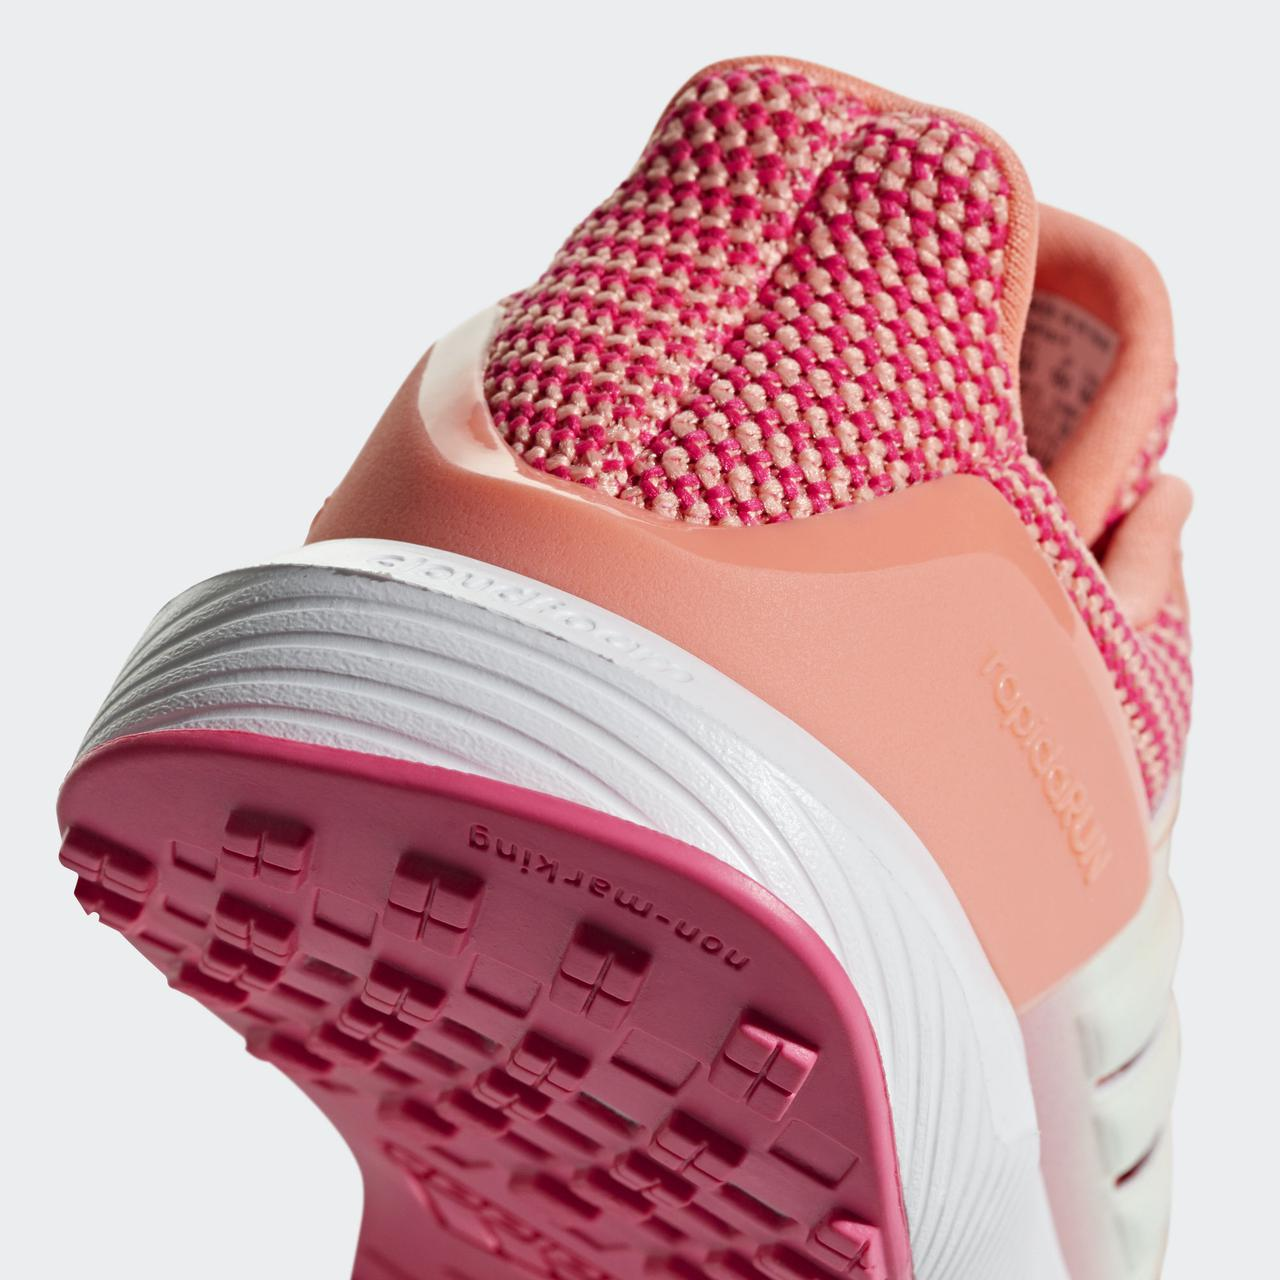 597c776b0915 ... Детские кроссовки Adidas Performance Rapidarun (Артикул  AH2391), ...